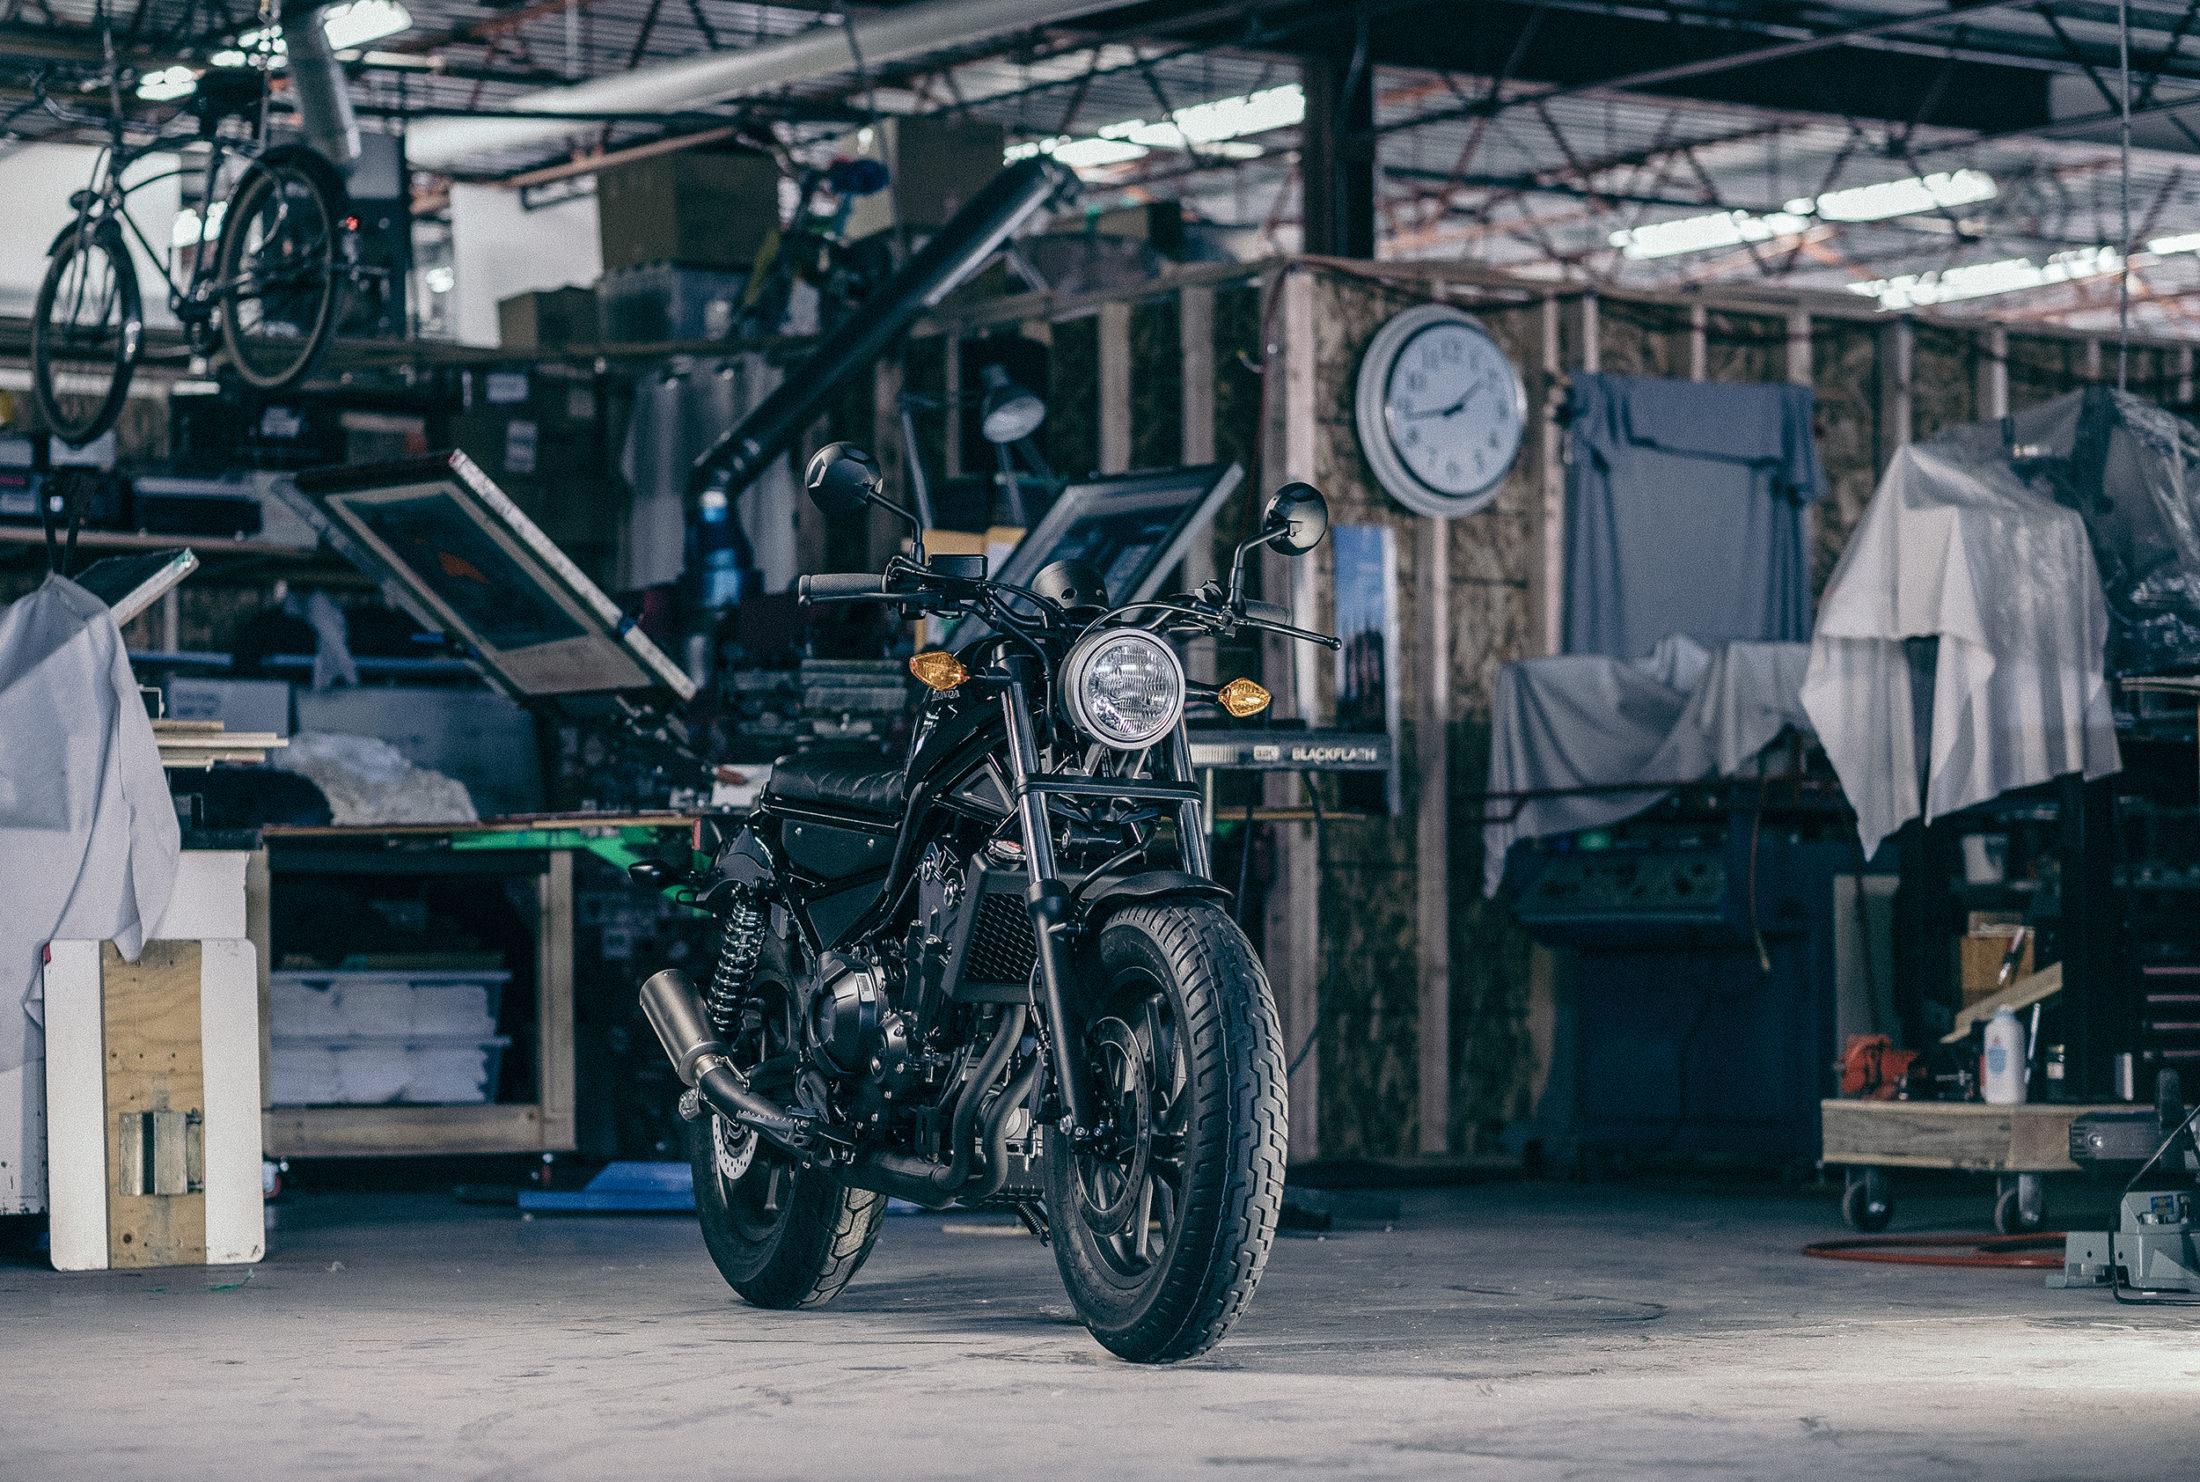 Pantheon Moto. Honda Motorcycle photo documentary.